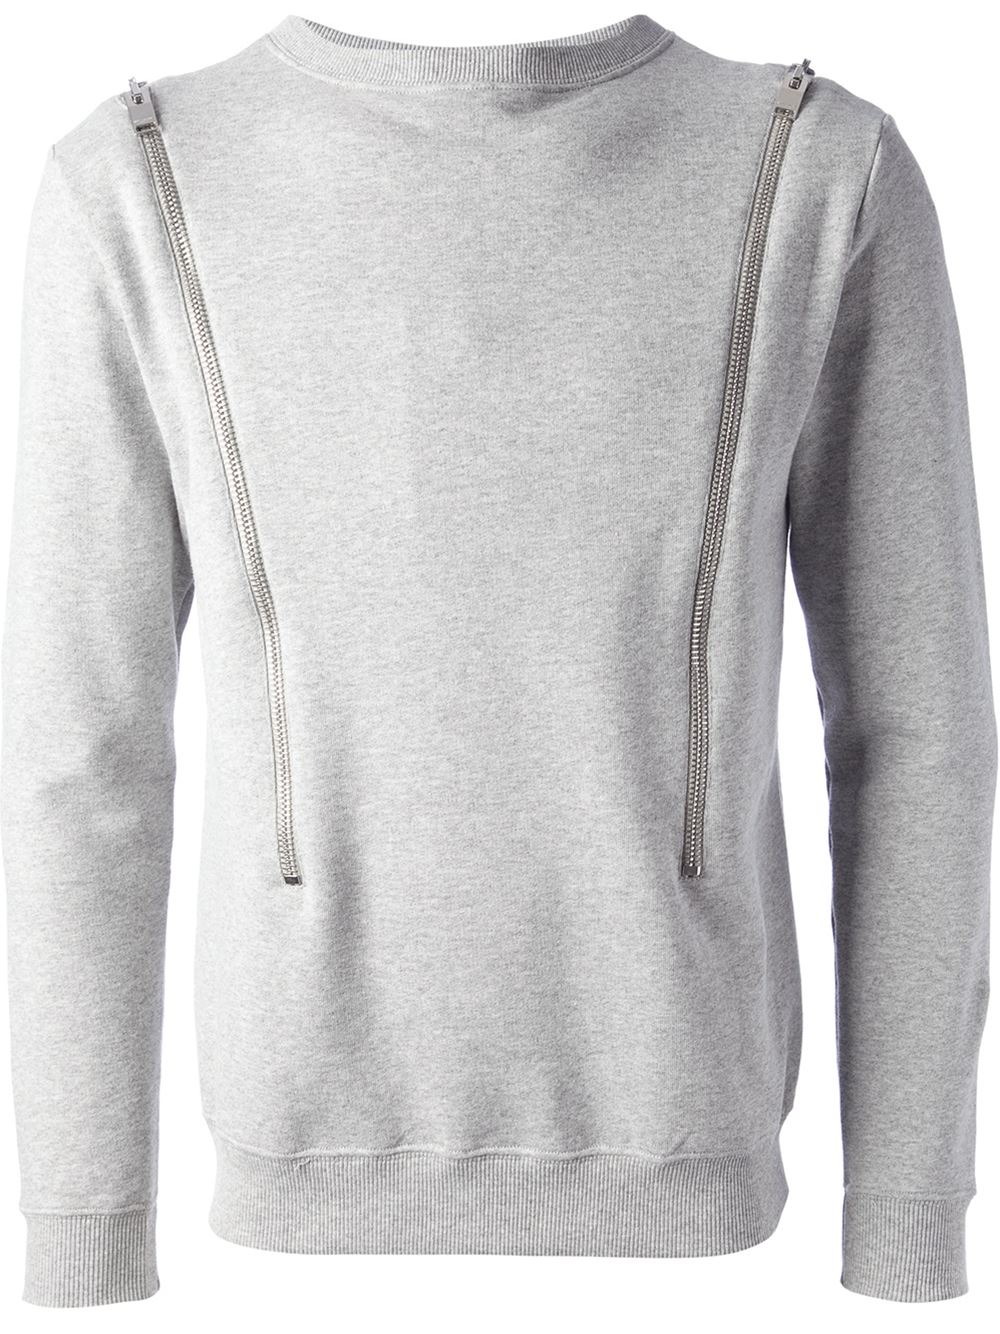 Saint Laurent Horizontal Zip Sweater - - Farfetch.com